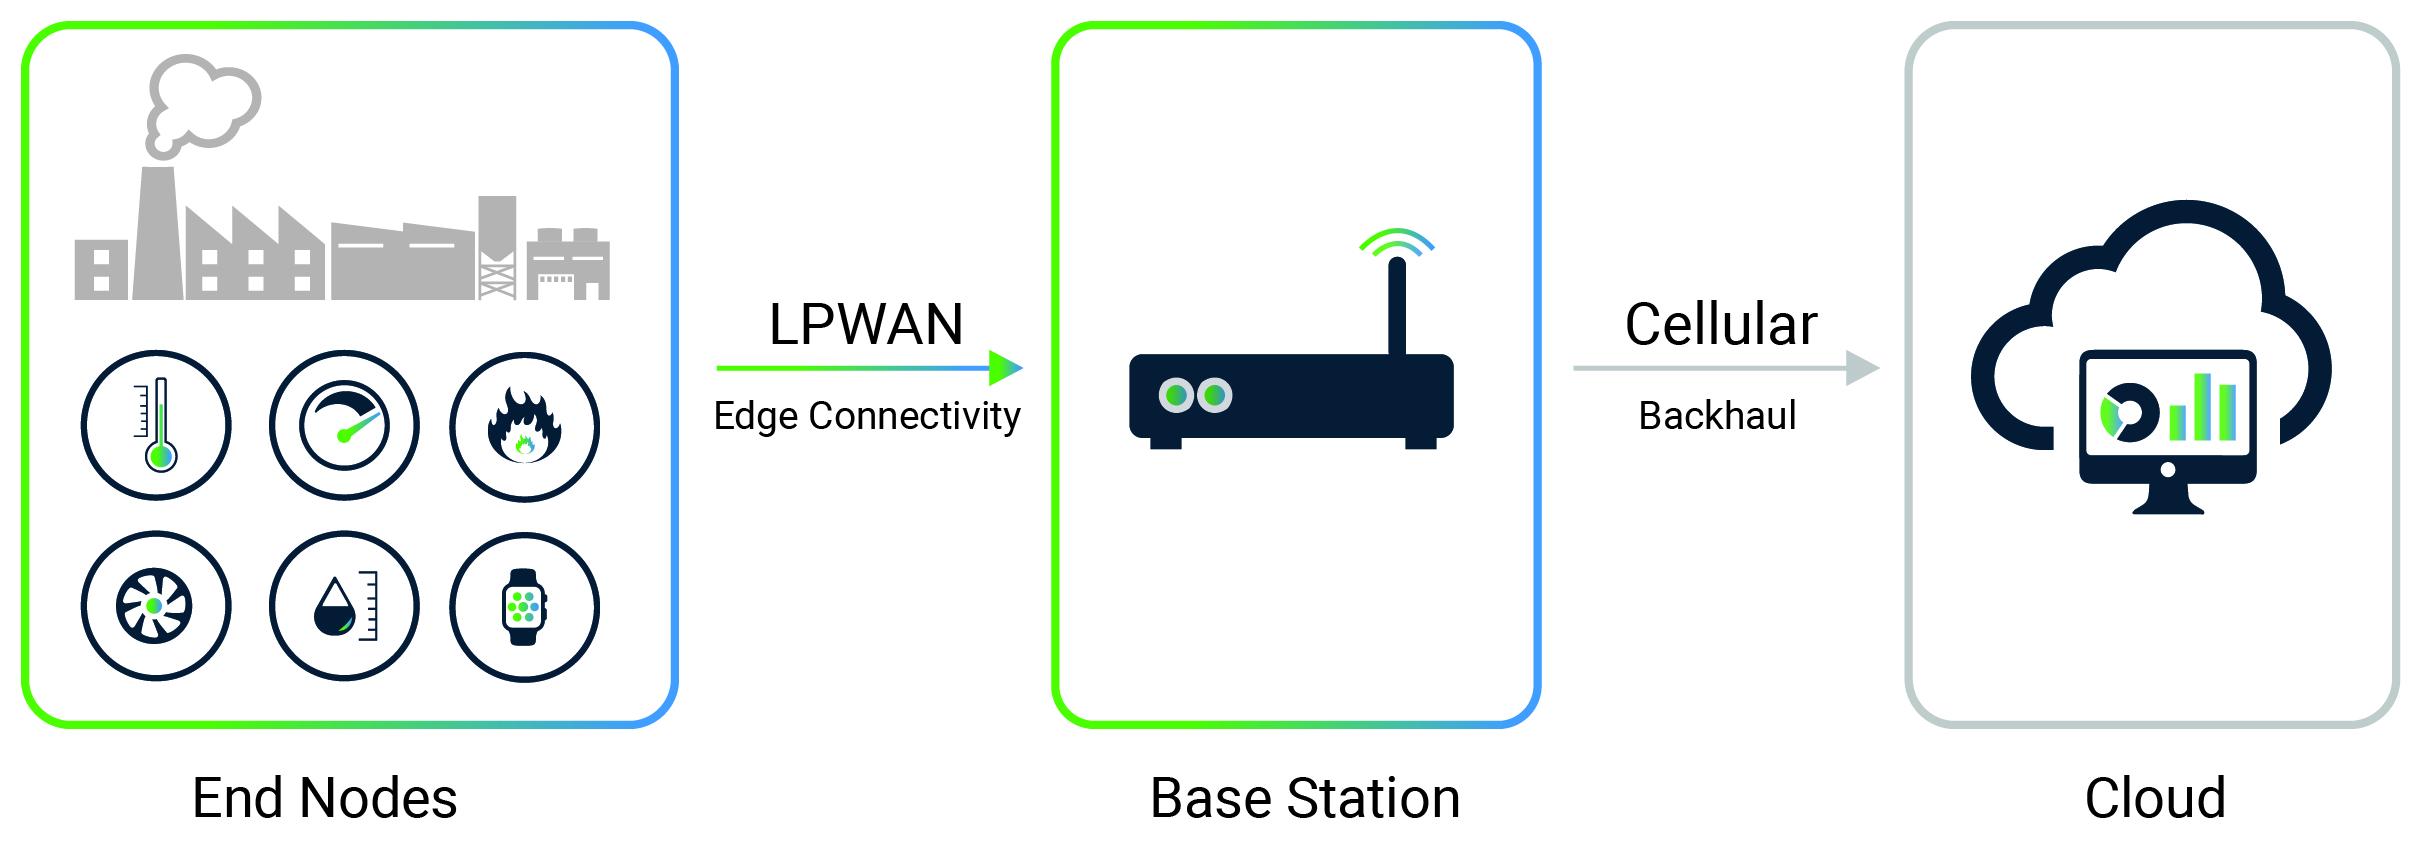 LPWAN & 5G